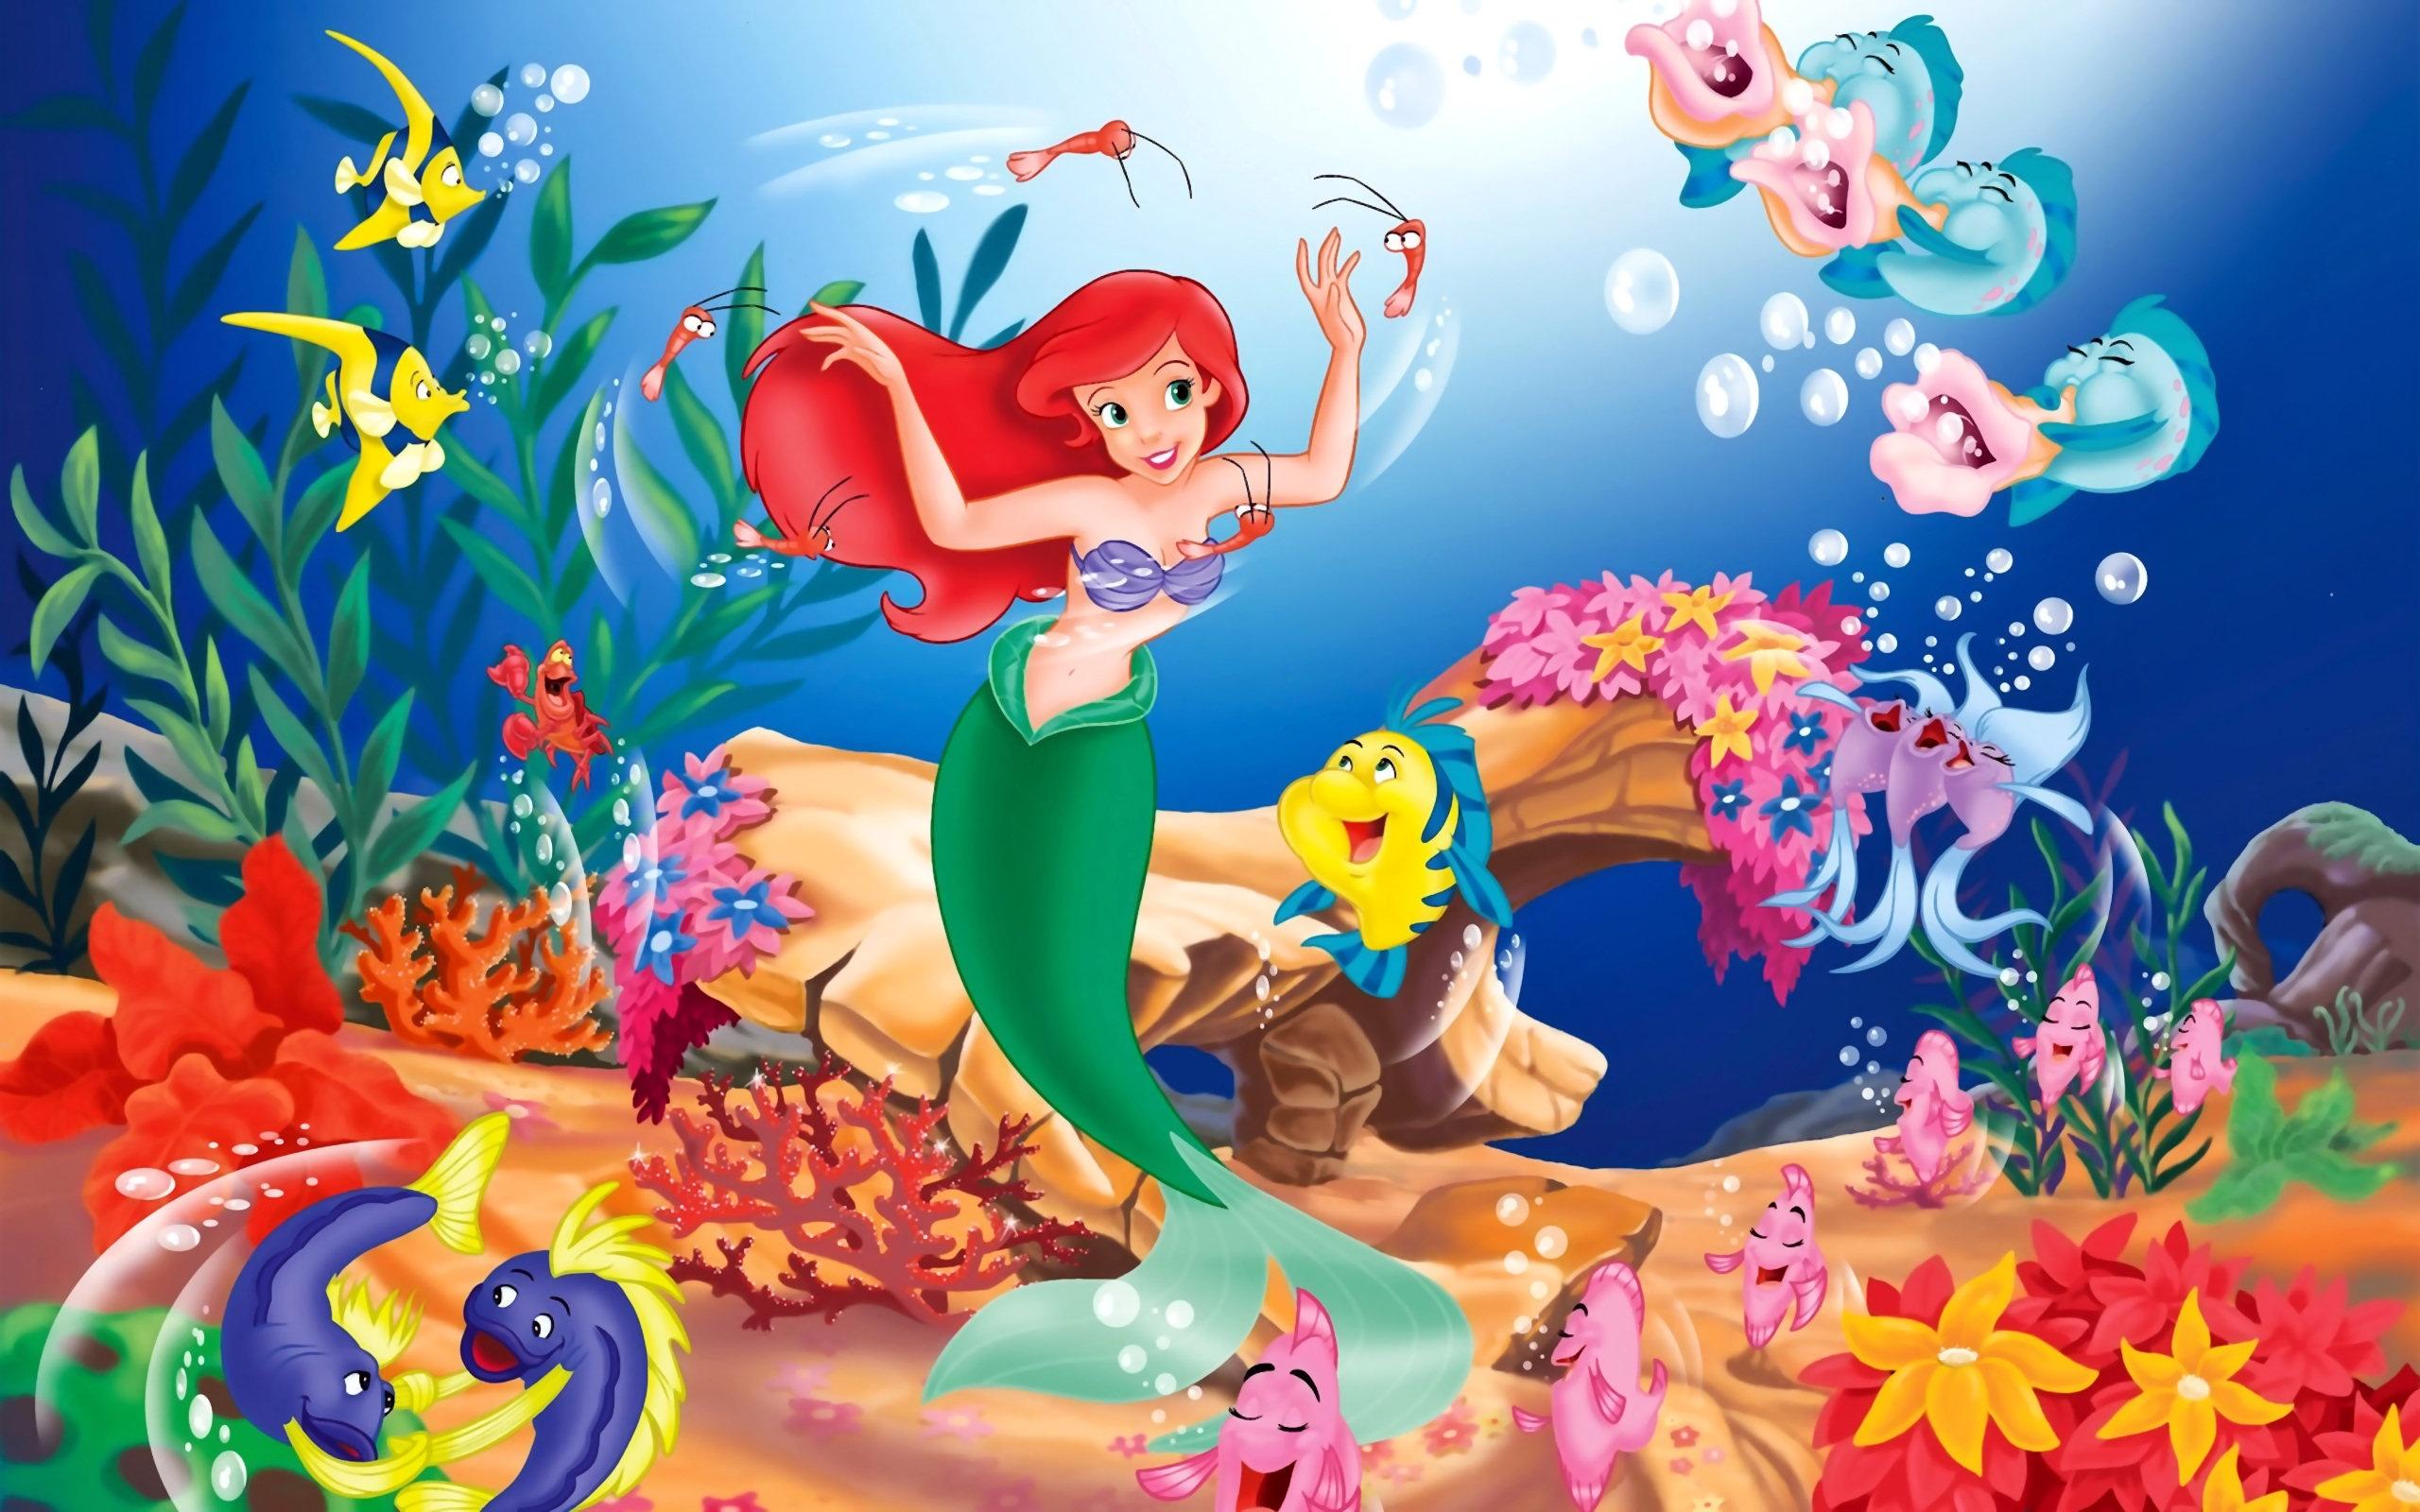 Disney The Little Mermaid Wallpapers HD Wallpapers 2560x1600